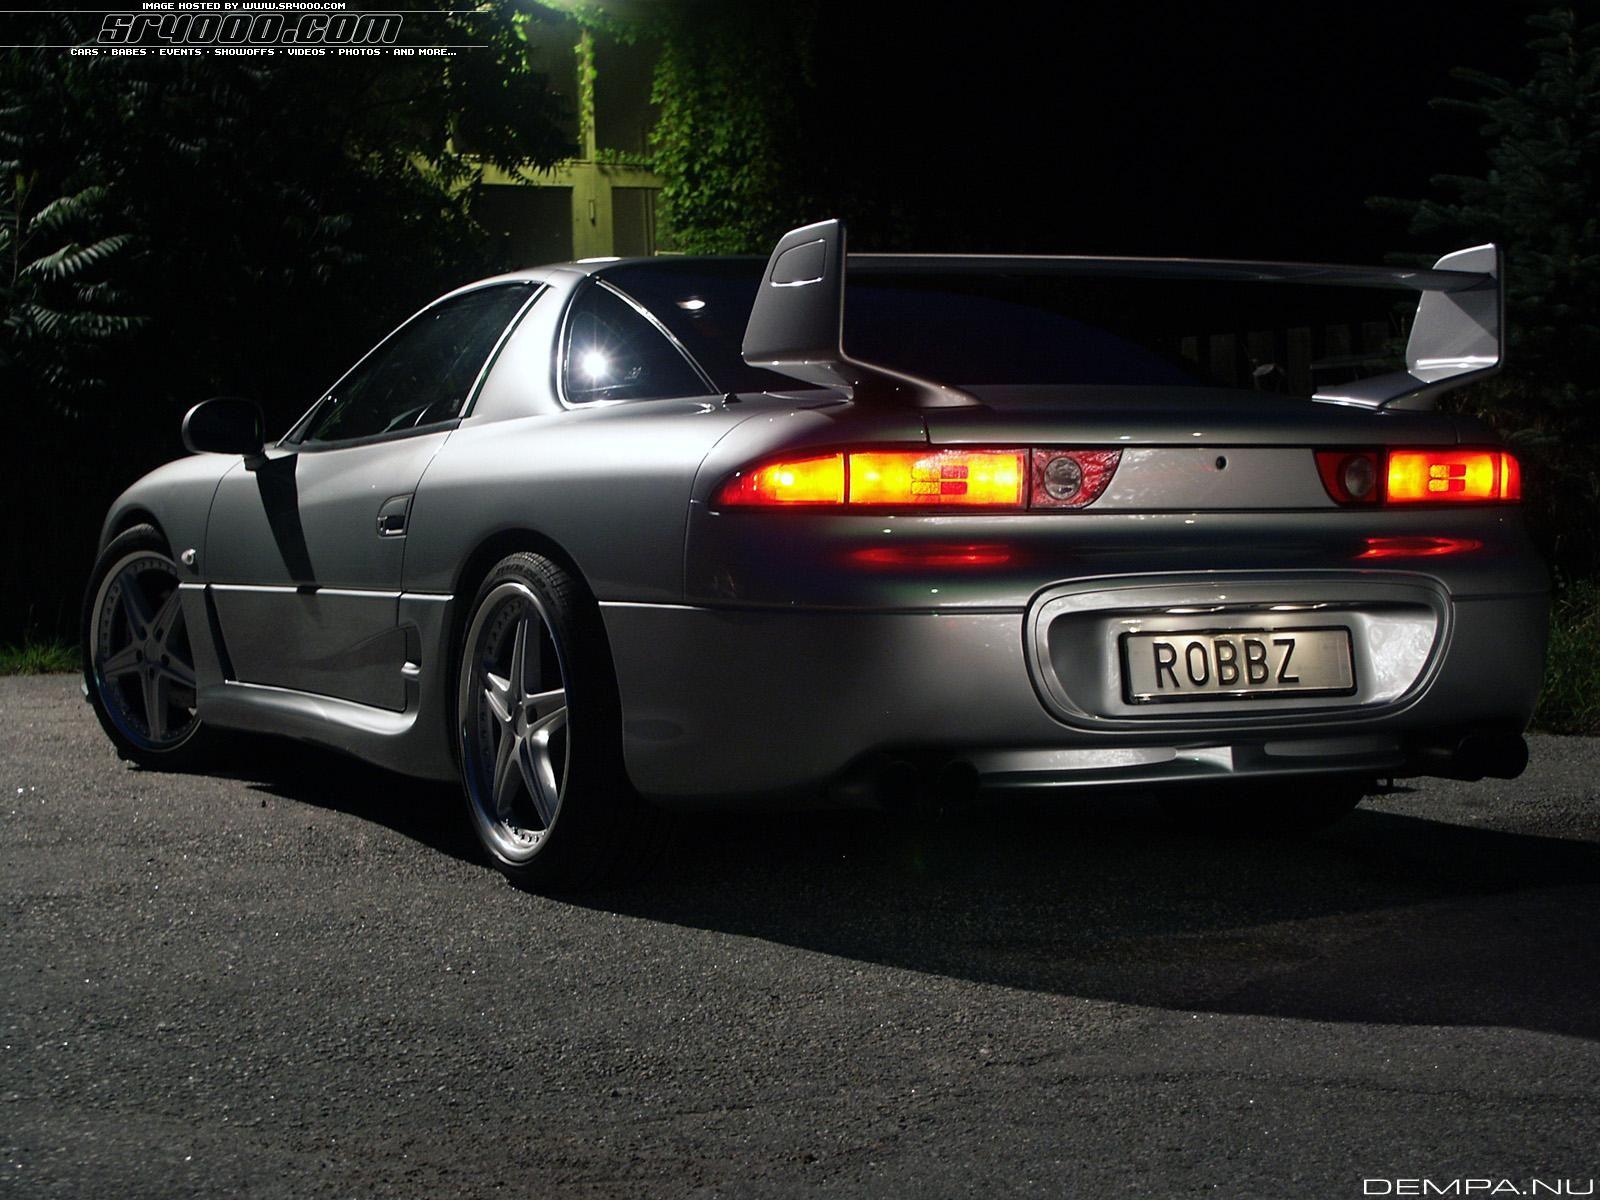 2018 Mitsubishi Gto >> Mitsubishi 3000 GT photos #15 on Better Parts LTD